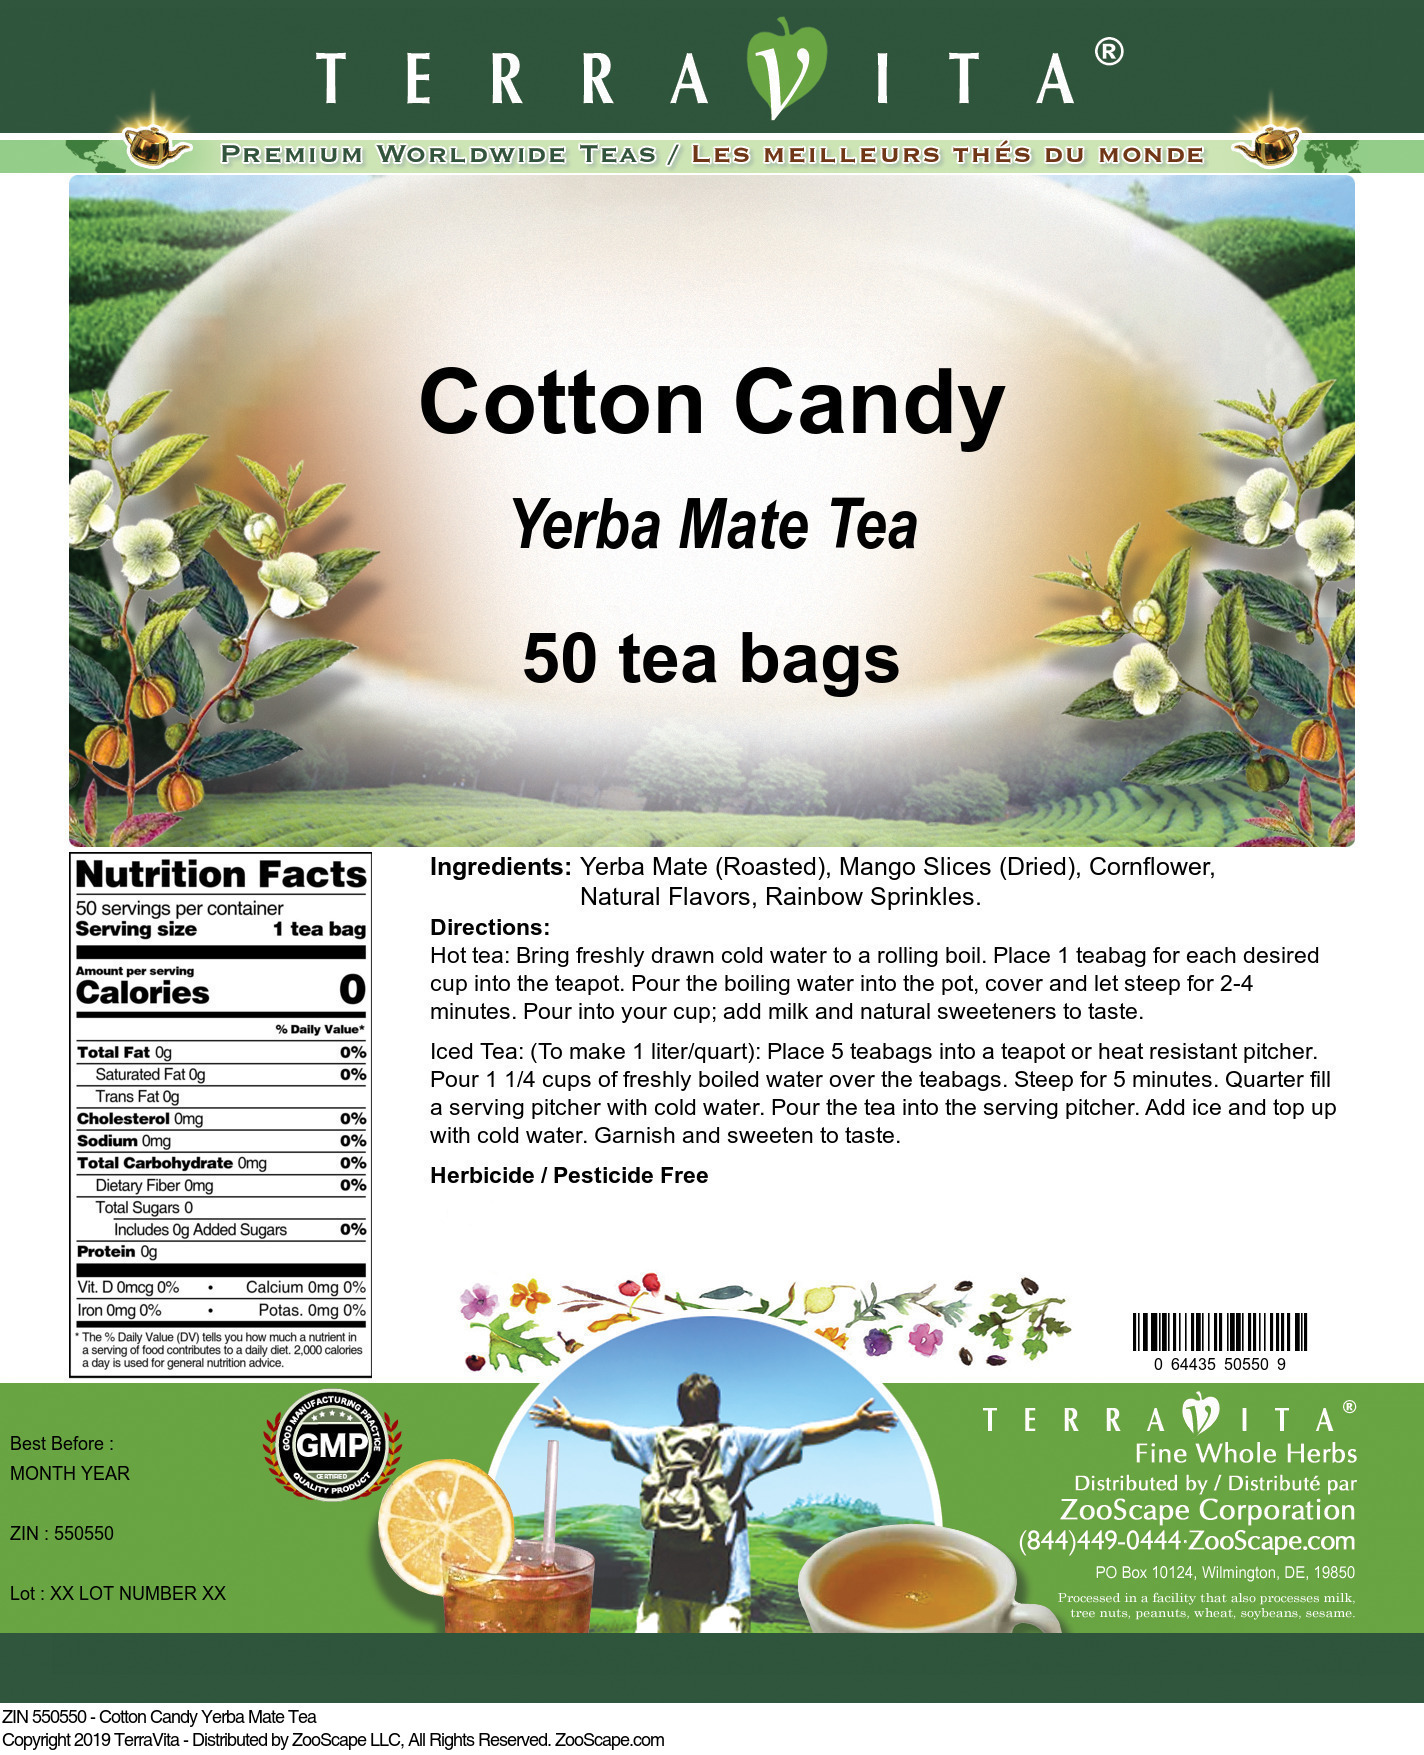 Cotton Candy Yerba Mate Tea